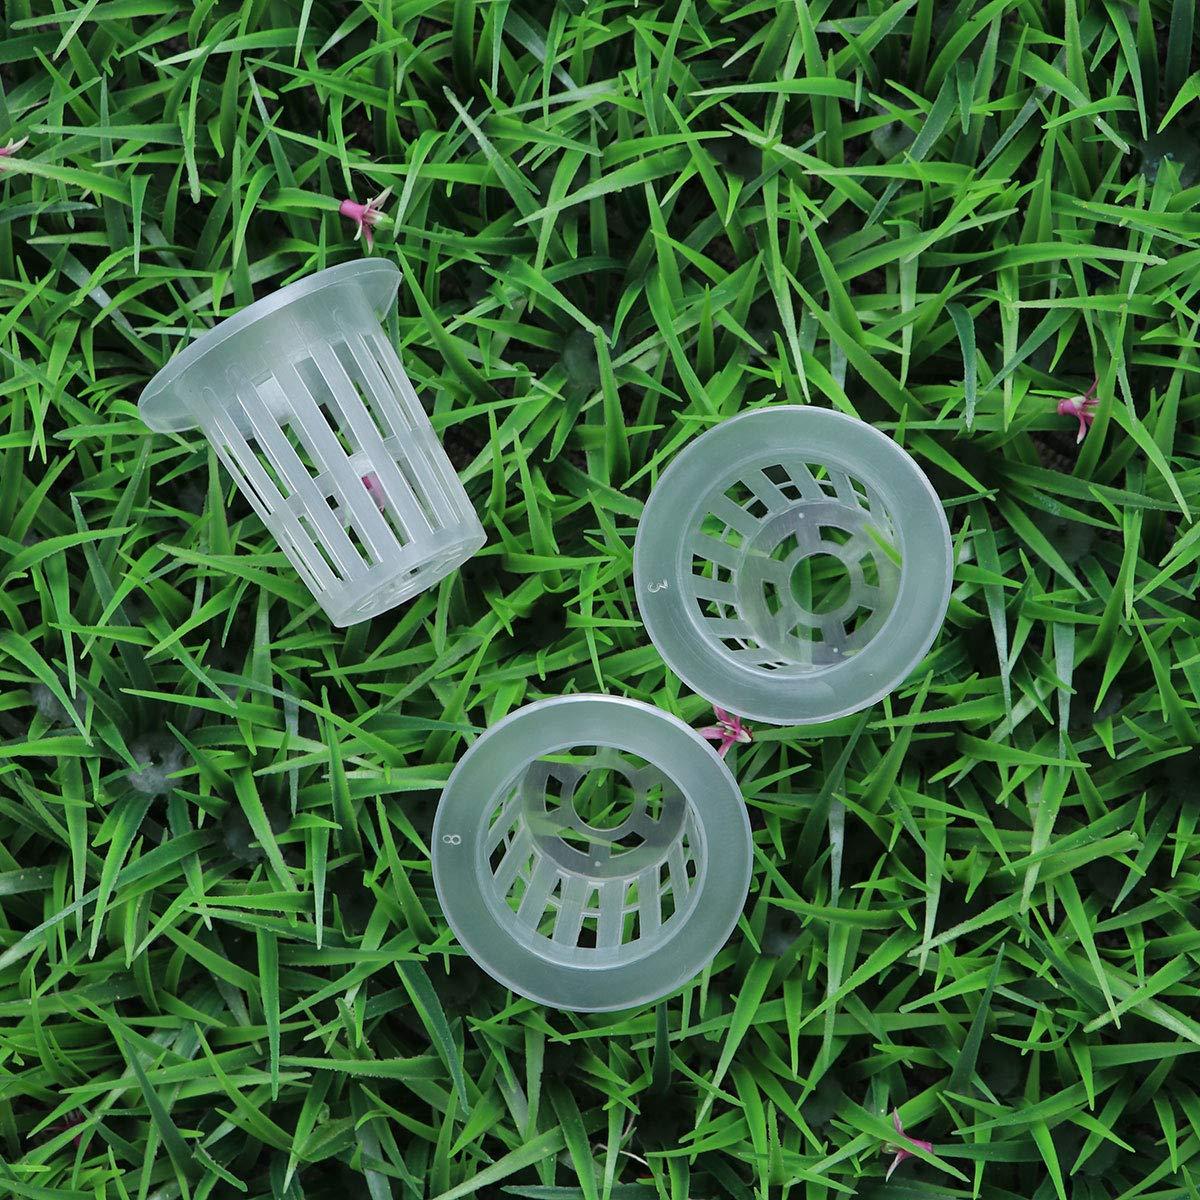 OUNONA 50pcs reti a rete scanalate vasi senza coltura cesti di verdure tazze per coltura idroponica//acquaponica//orchidee